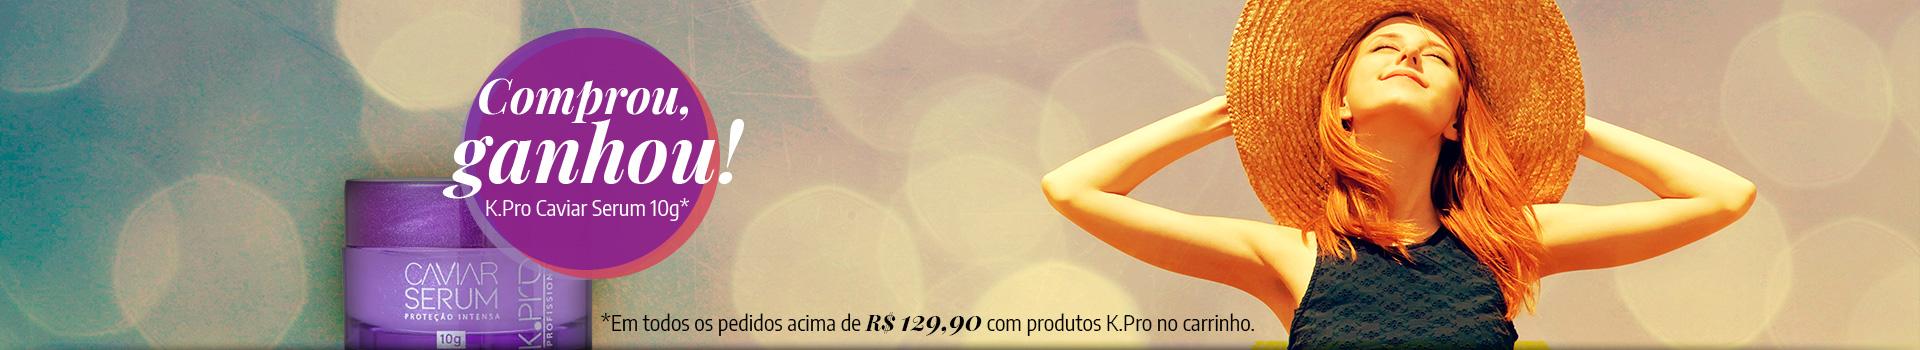 K.Pro Caviar Serum 10g